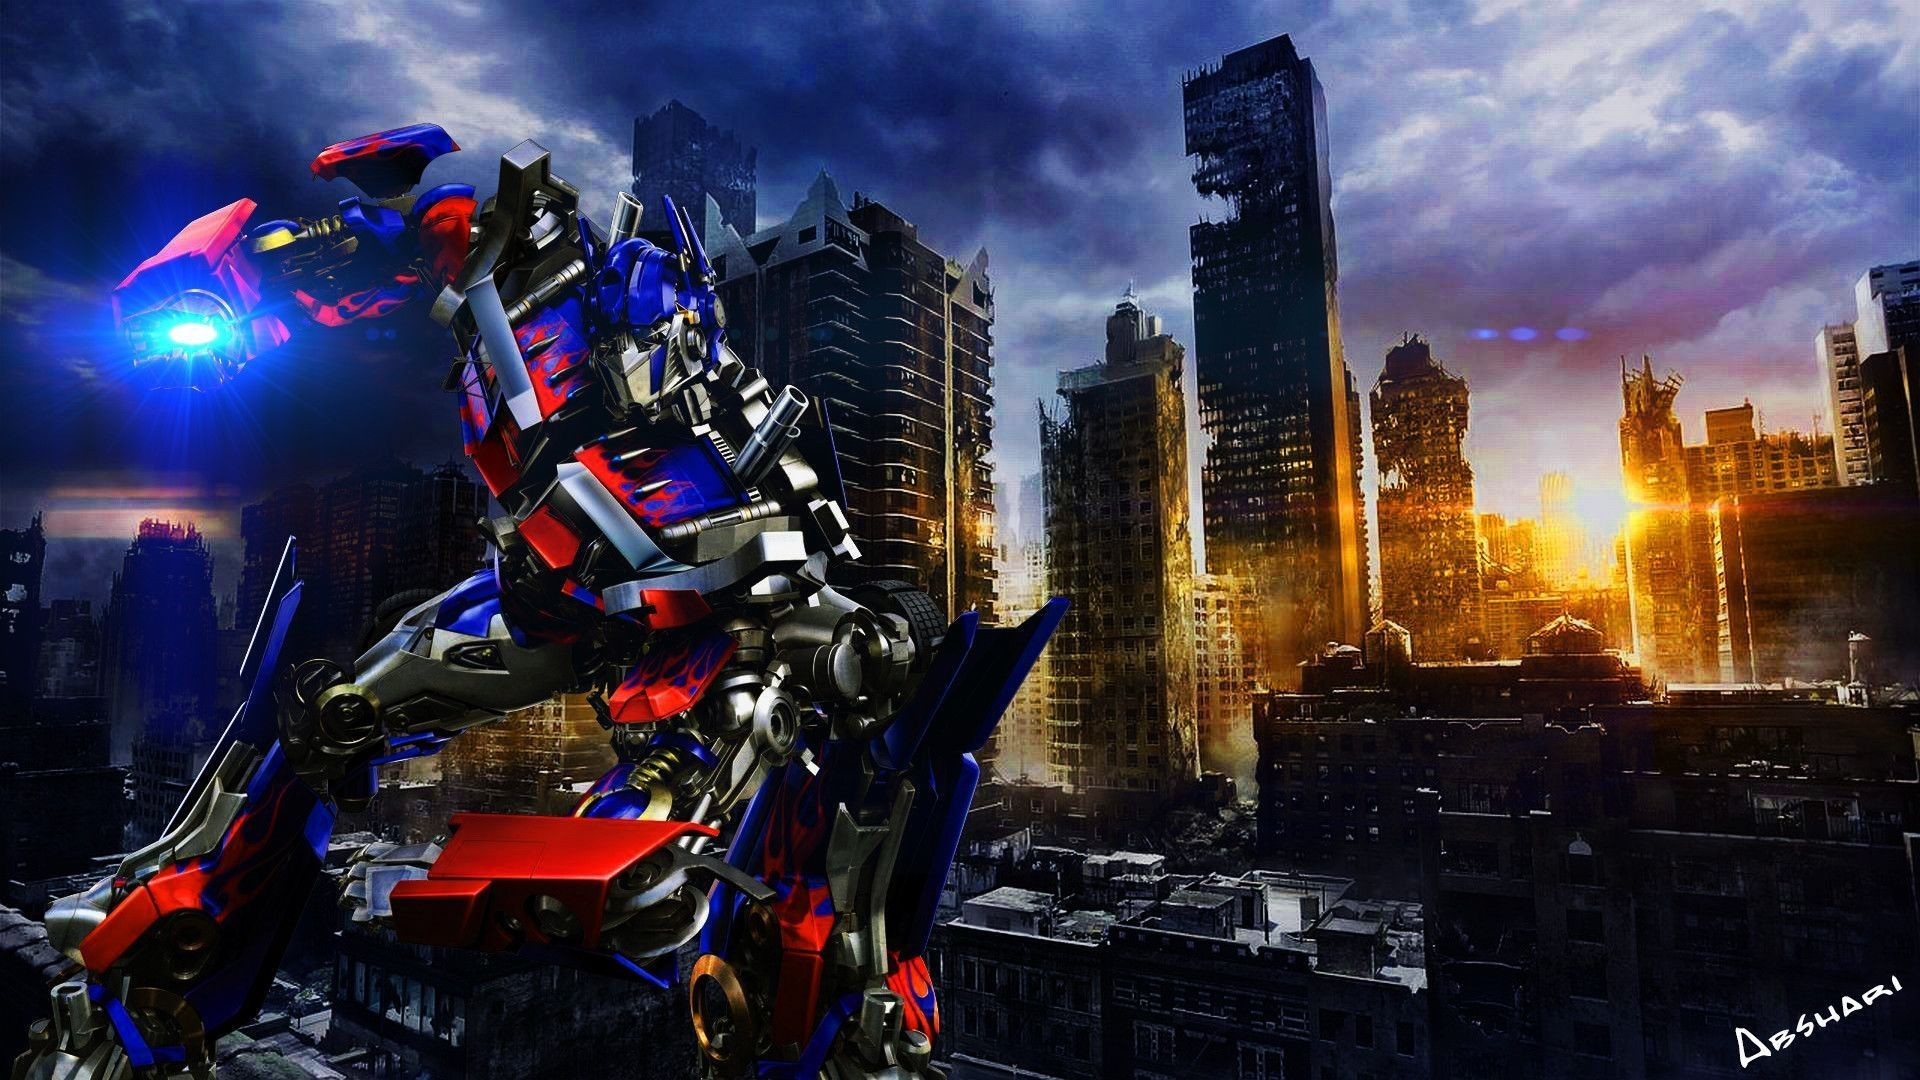 Optimus Prime Backgrounds – Wallpaper Cave